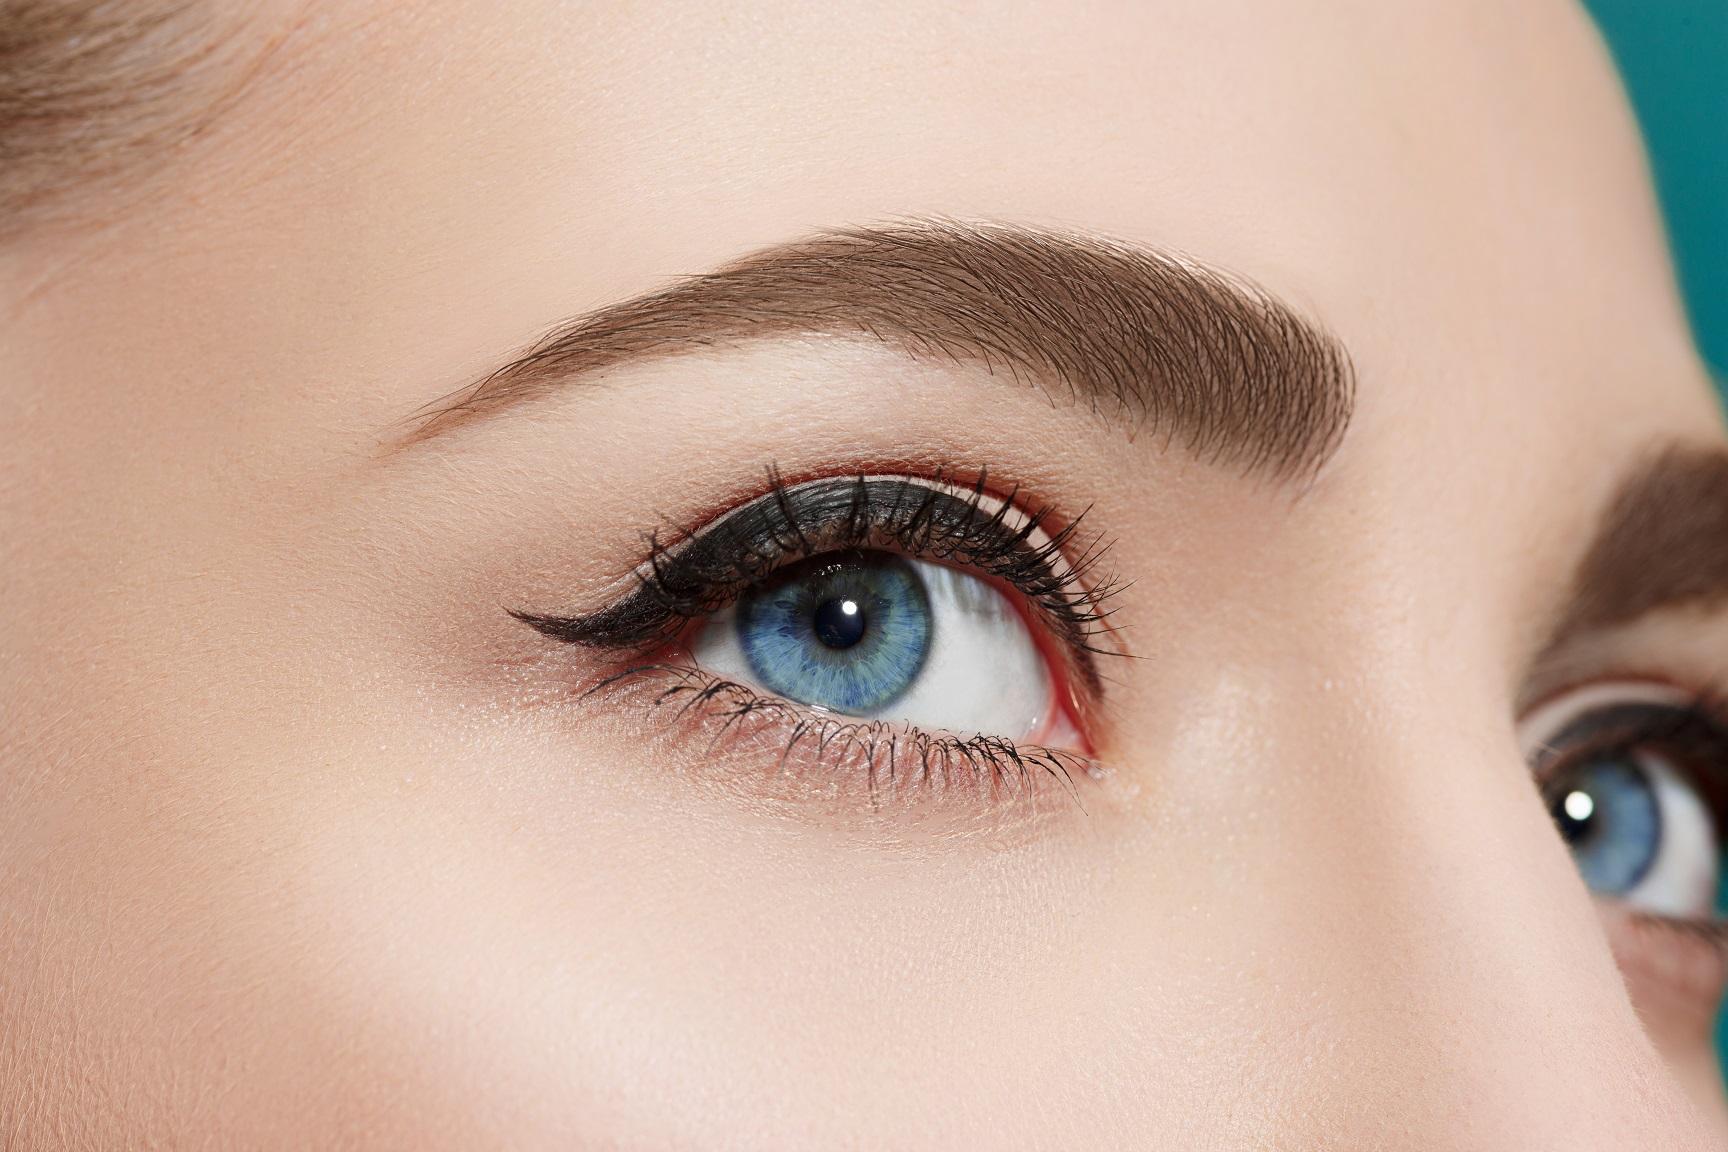 The beautiful female eye close up on blue background.